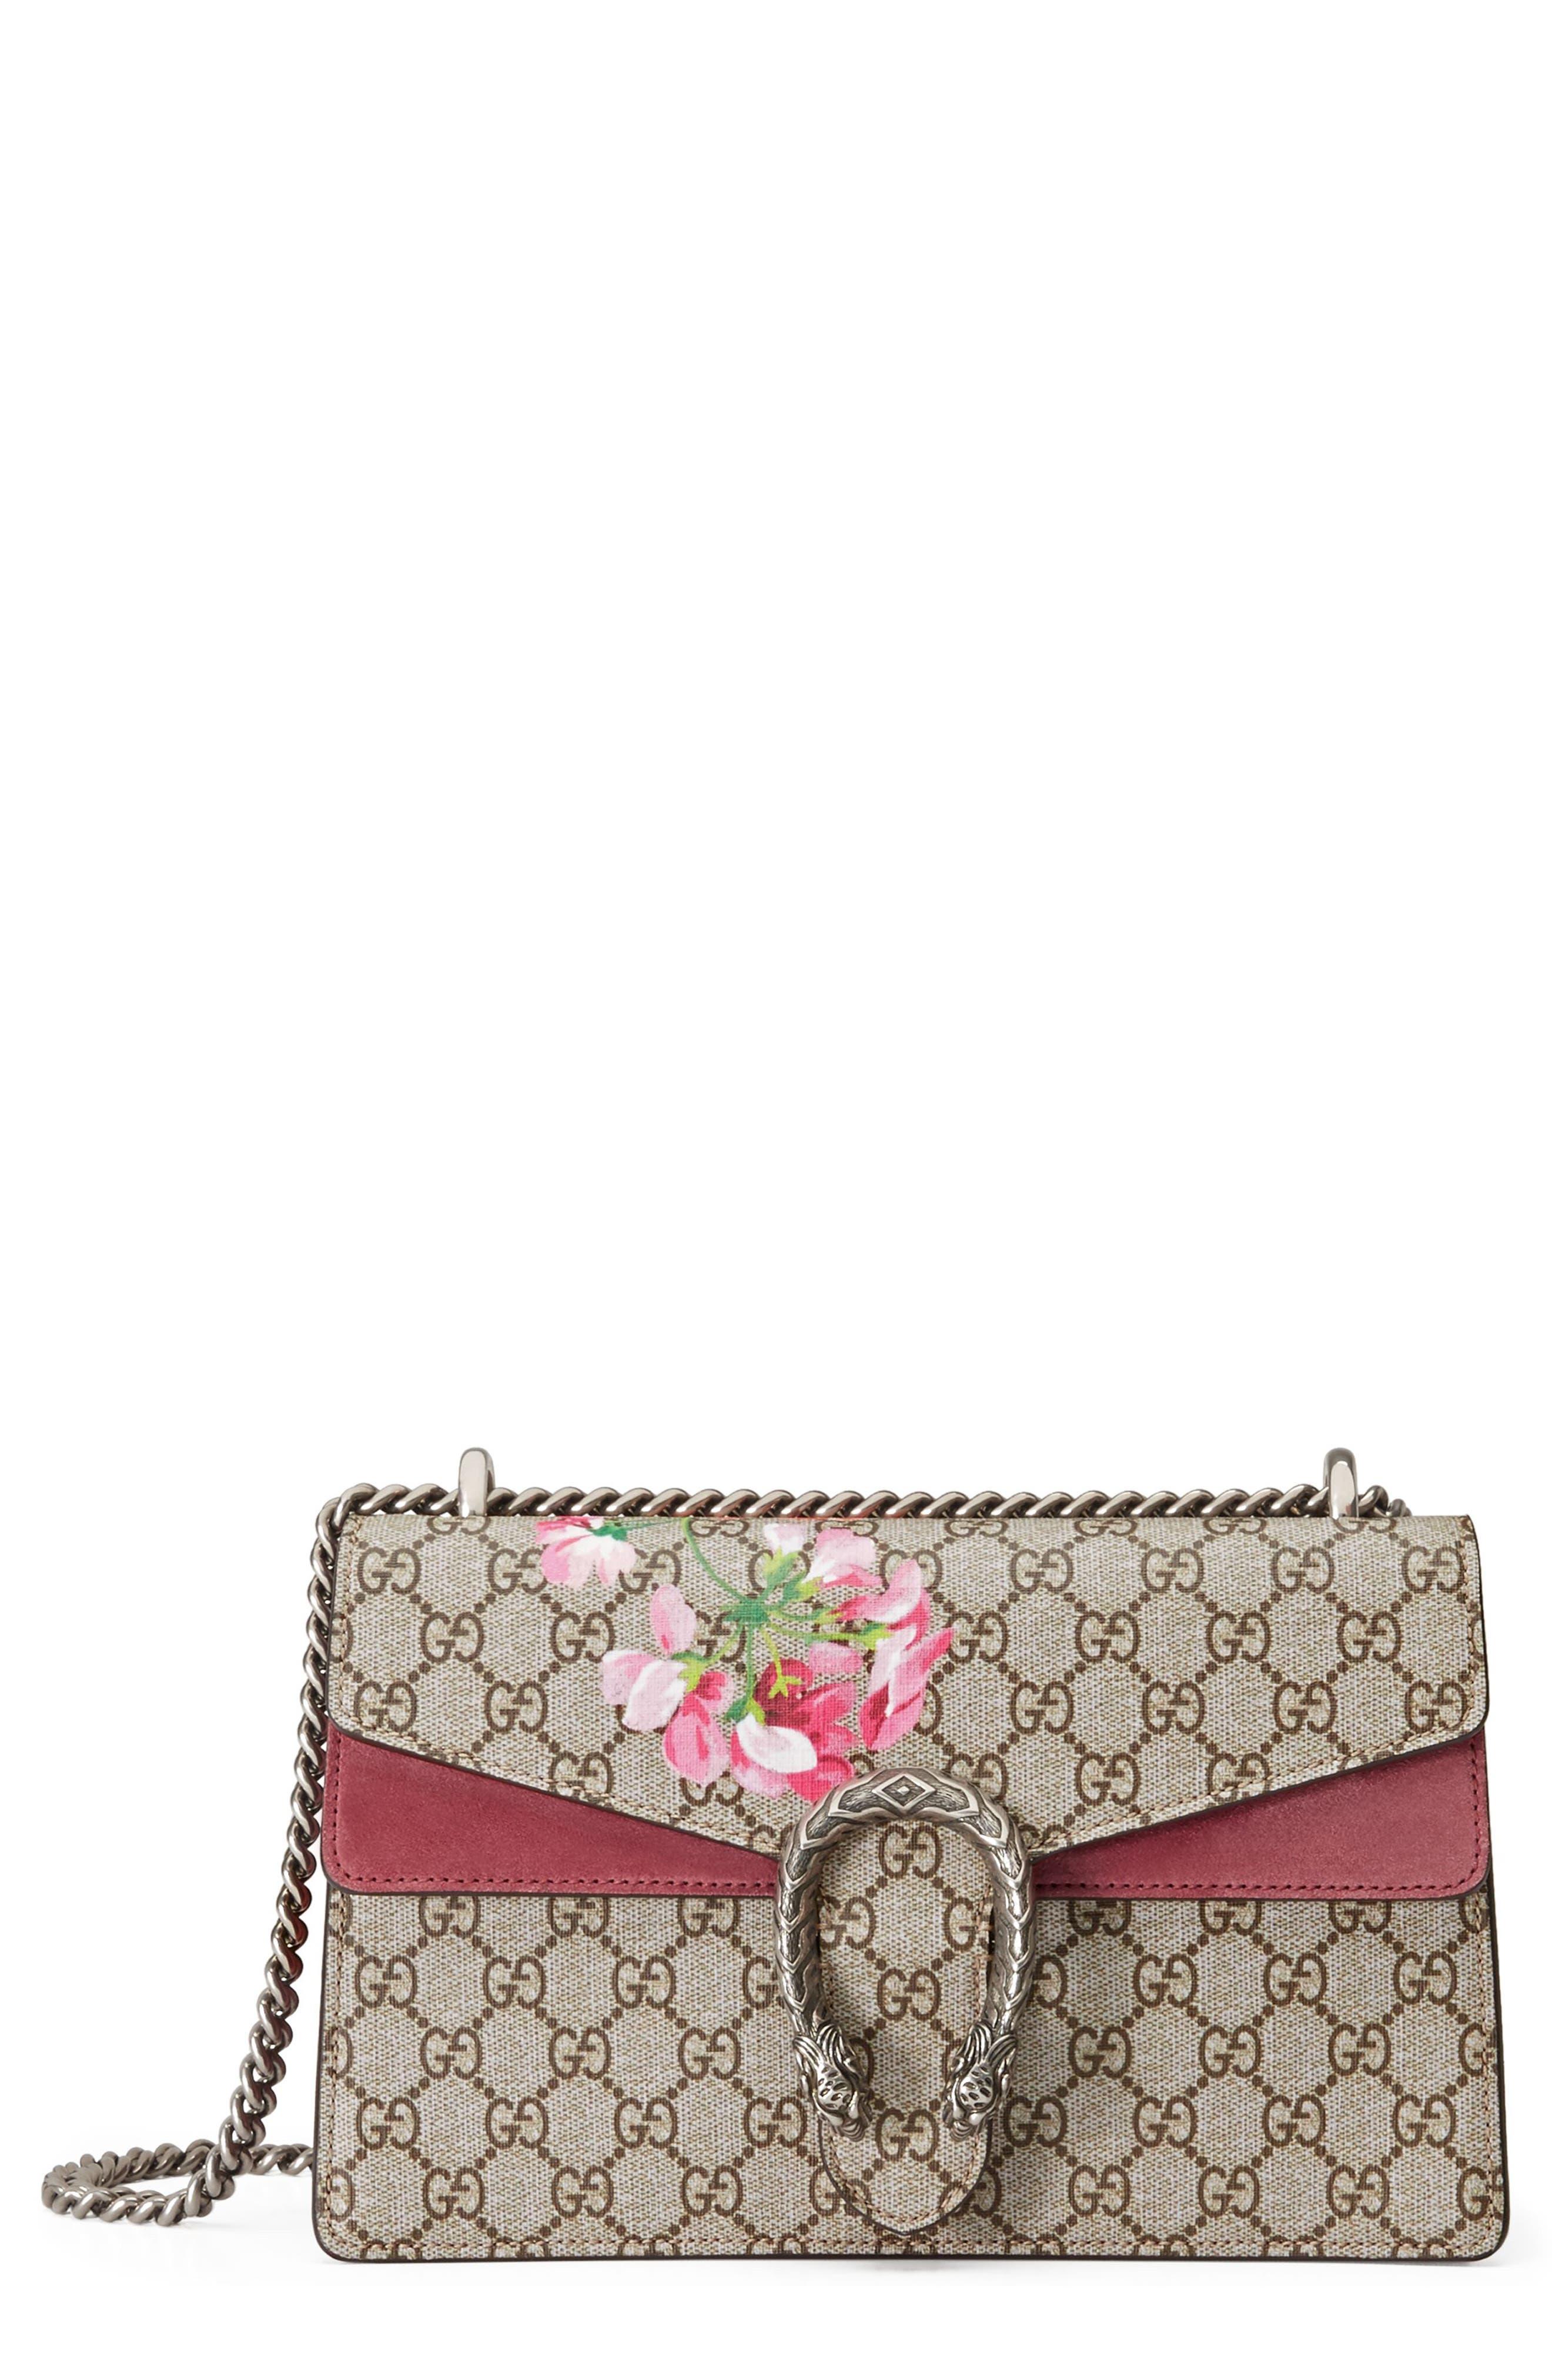 Small Dionysus Floral GG Supreme Canvas Shoulder Bag,                             Main thumbnail 1, color,